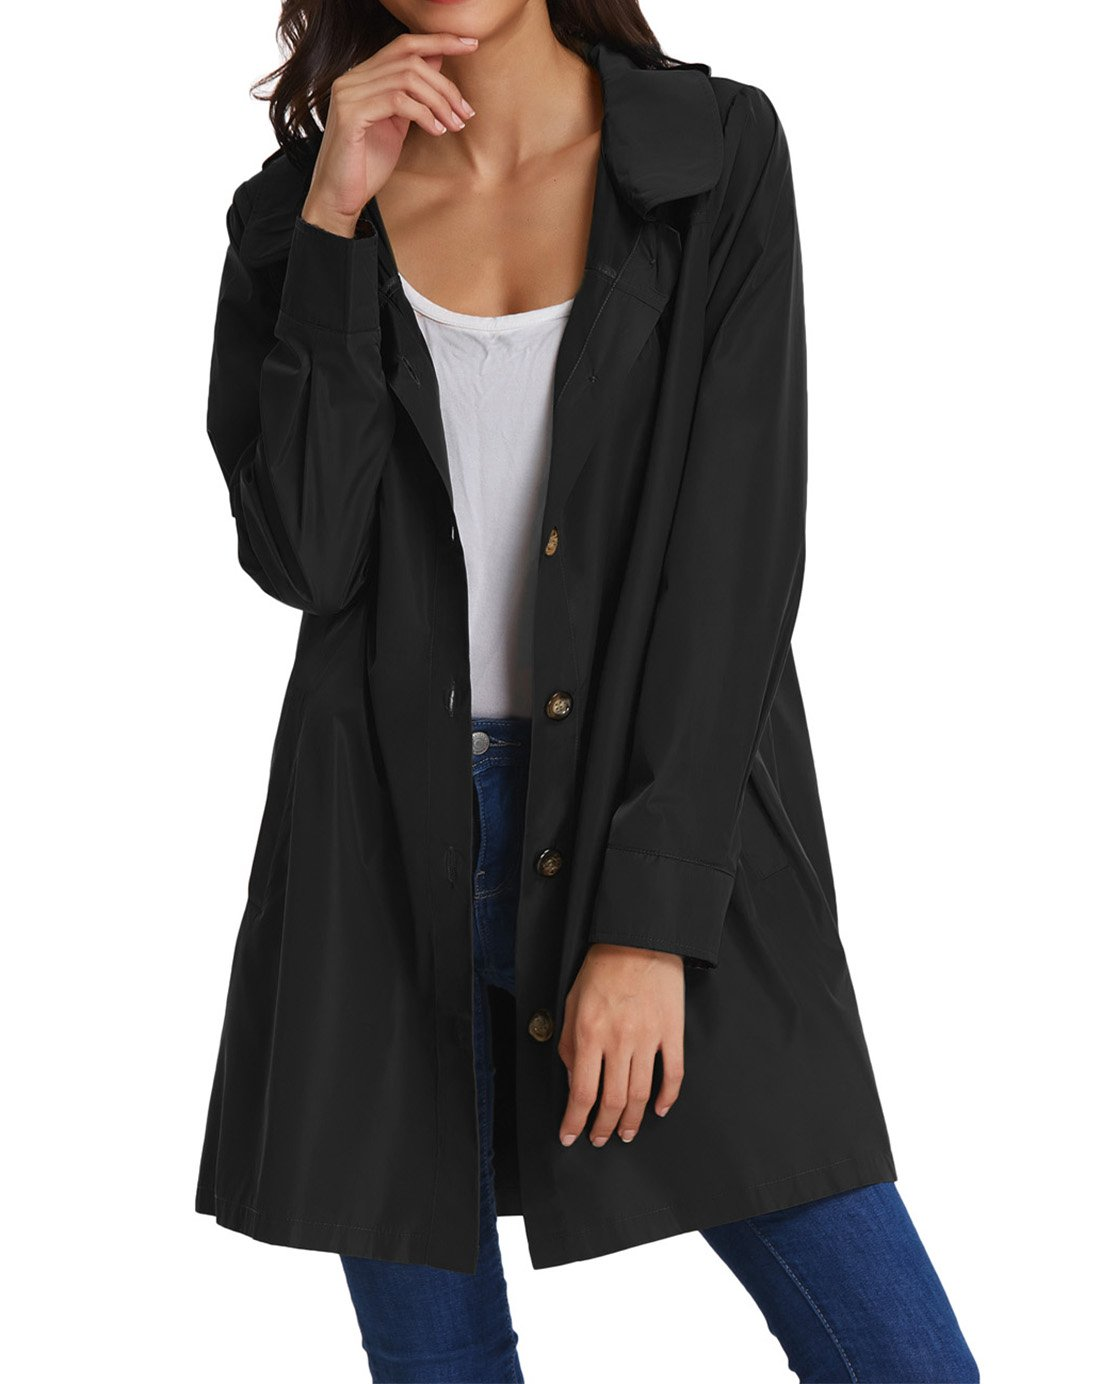 Womens Lightweight Raincoat Hooded Waterproof Active Outdoor Rain Jacket KK822-1 M Black